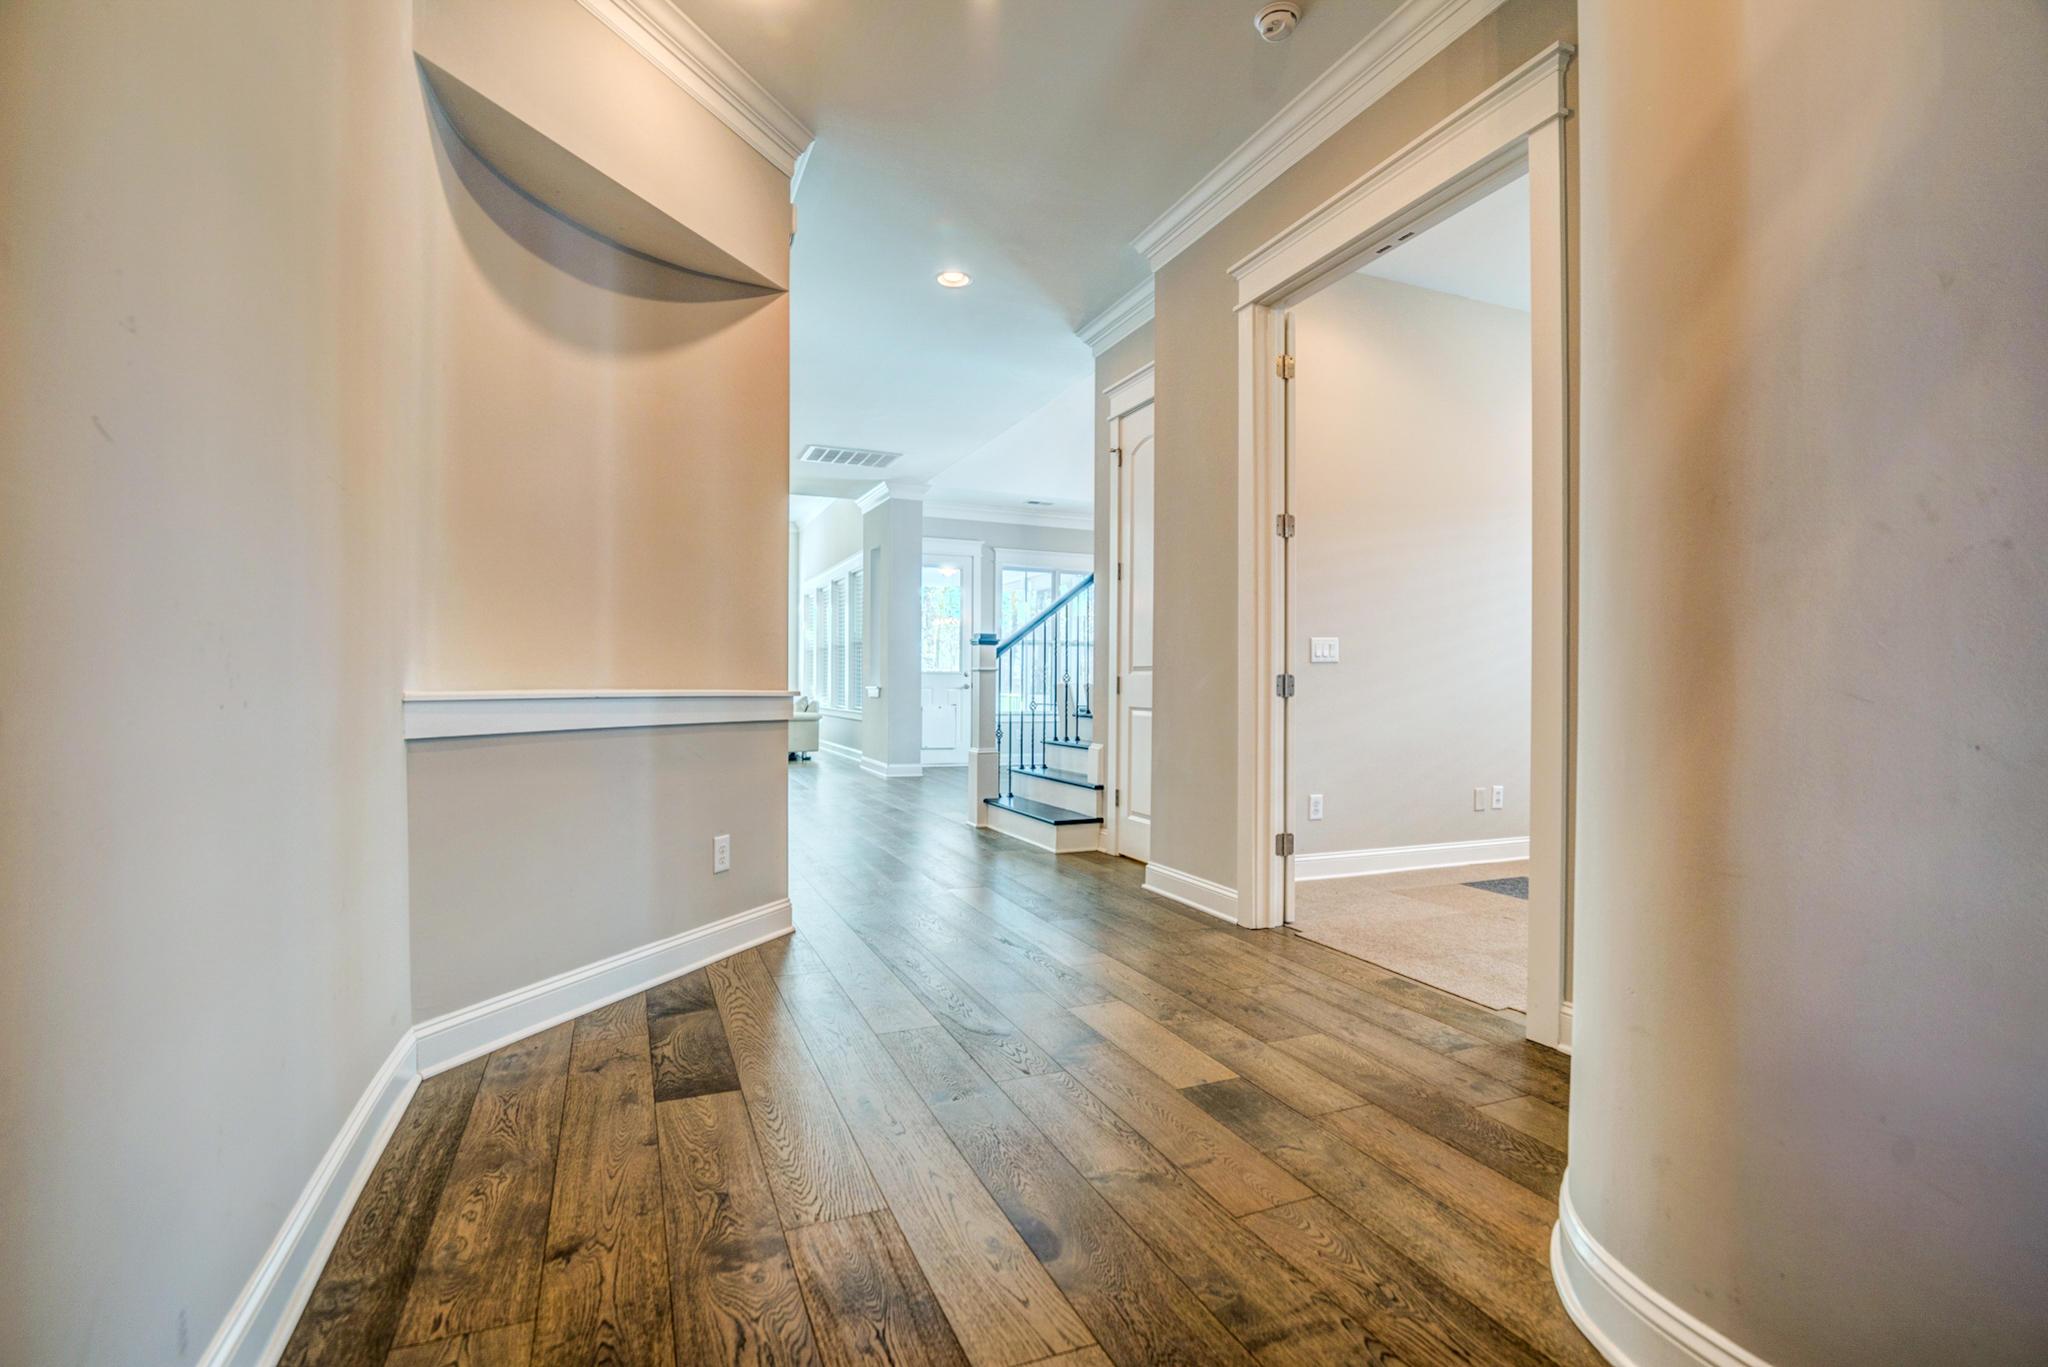 Carolina Park Homes For Sale - 3687 Spindrift, Mount Pleasant, SC - 15